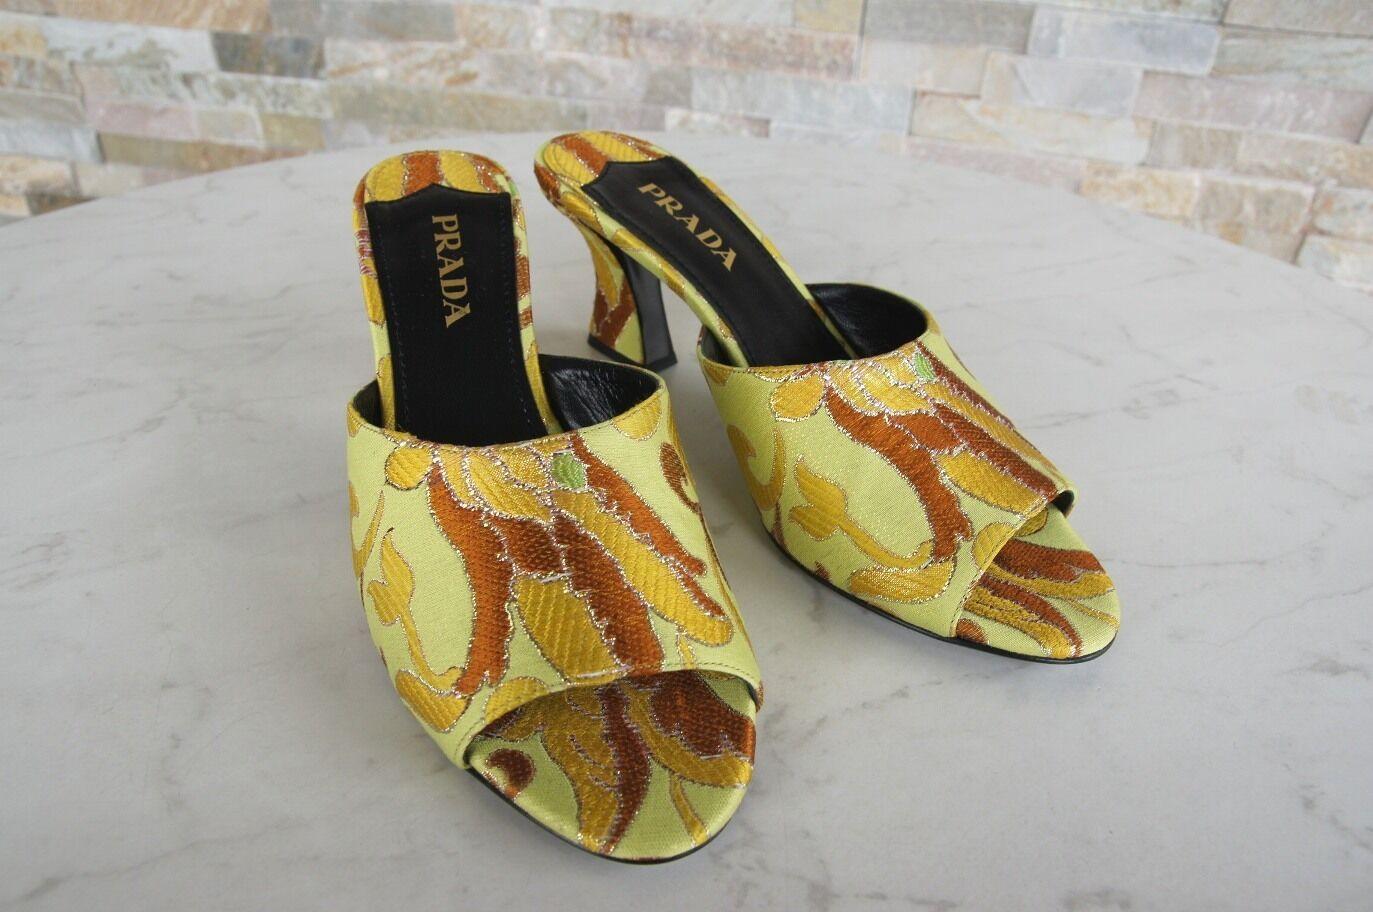 PRADA Gr 37 Pantoletten Pantoletten Pantoletten Sandaletten Sandalen Schuhe Lime Limone NEU 25168a